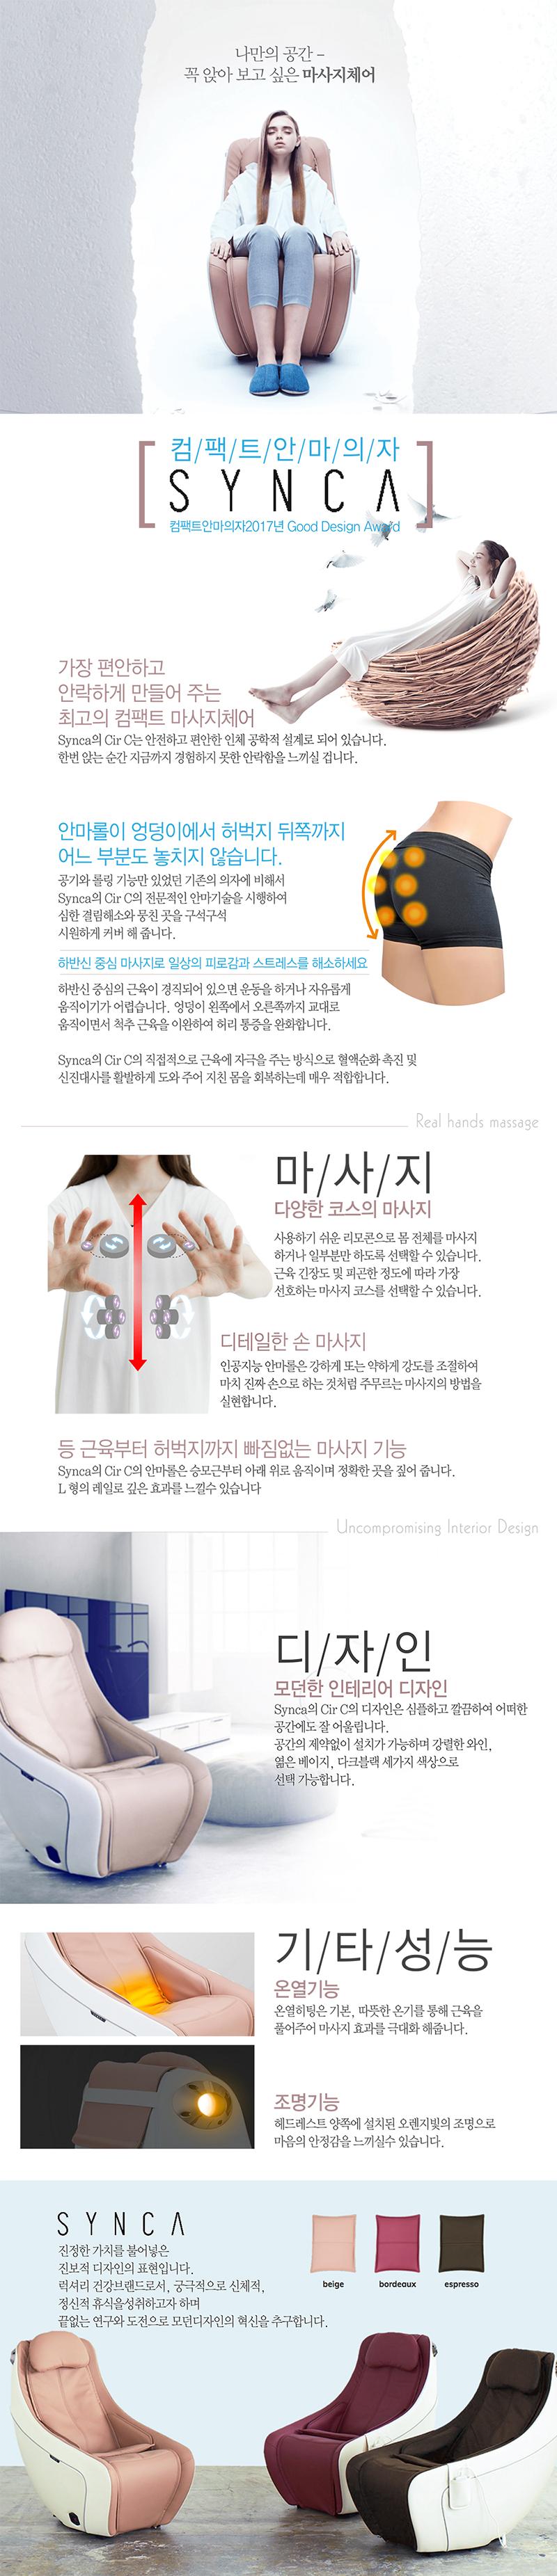 SYNCA_internet_outline.jpg